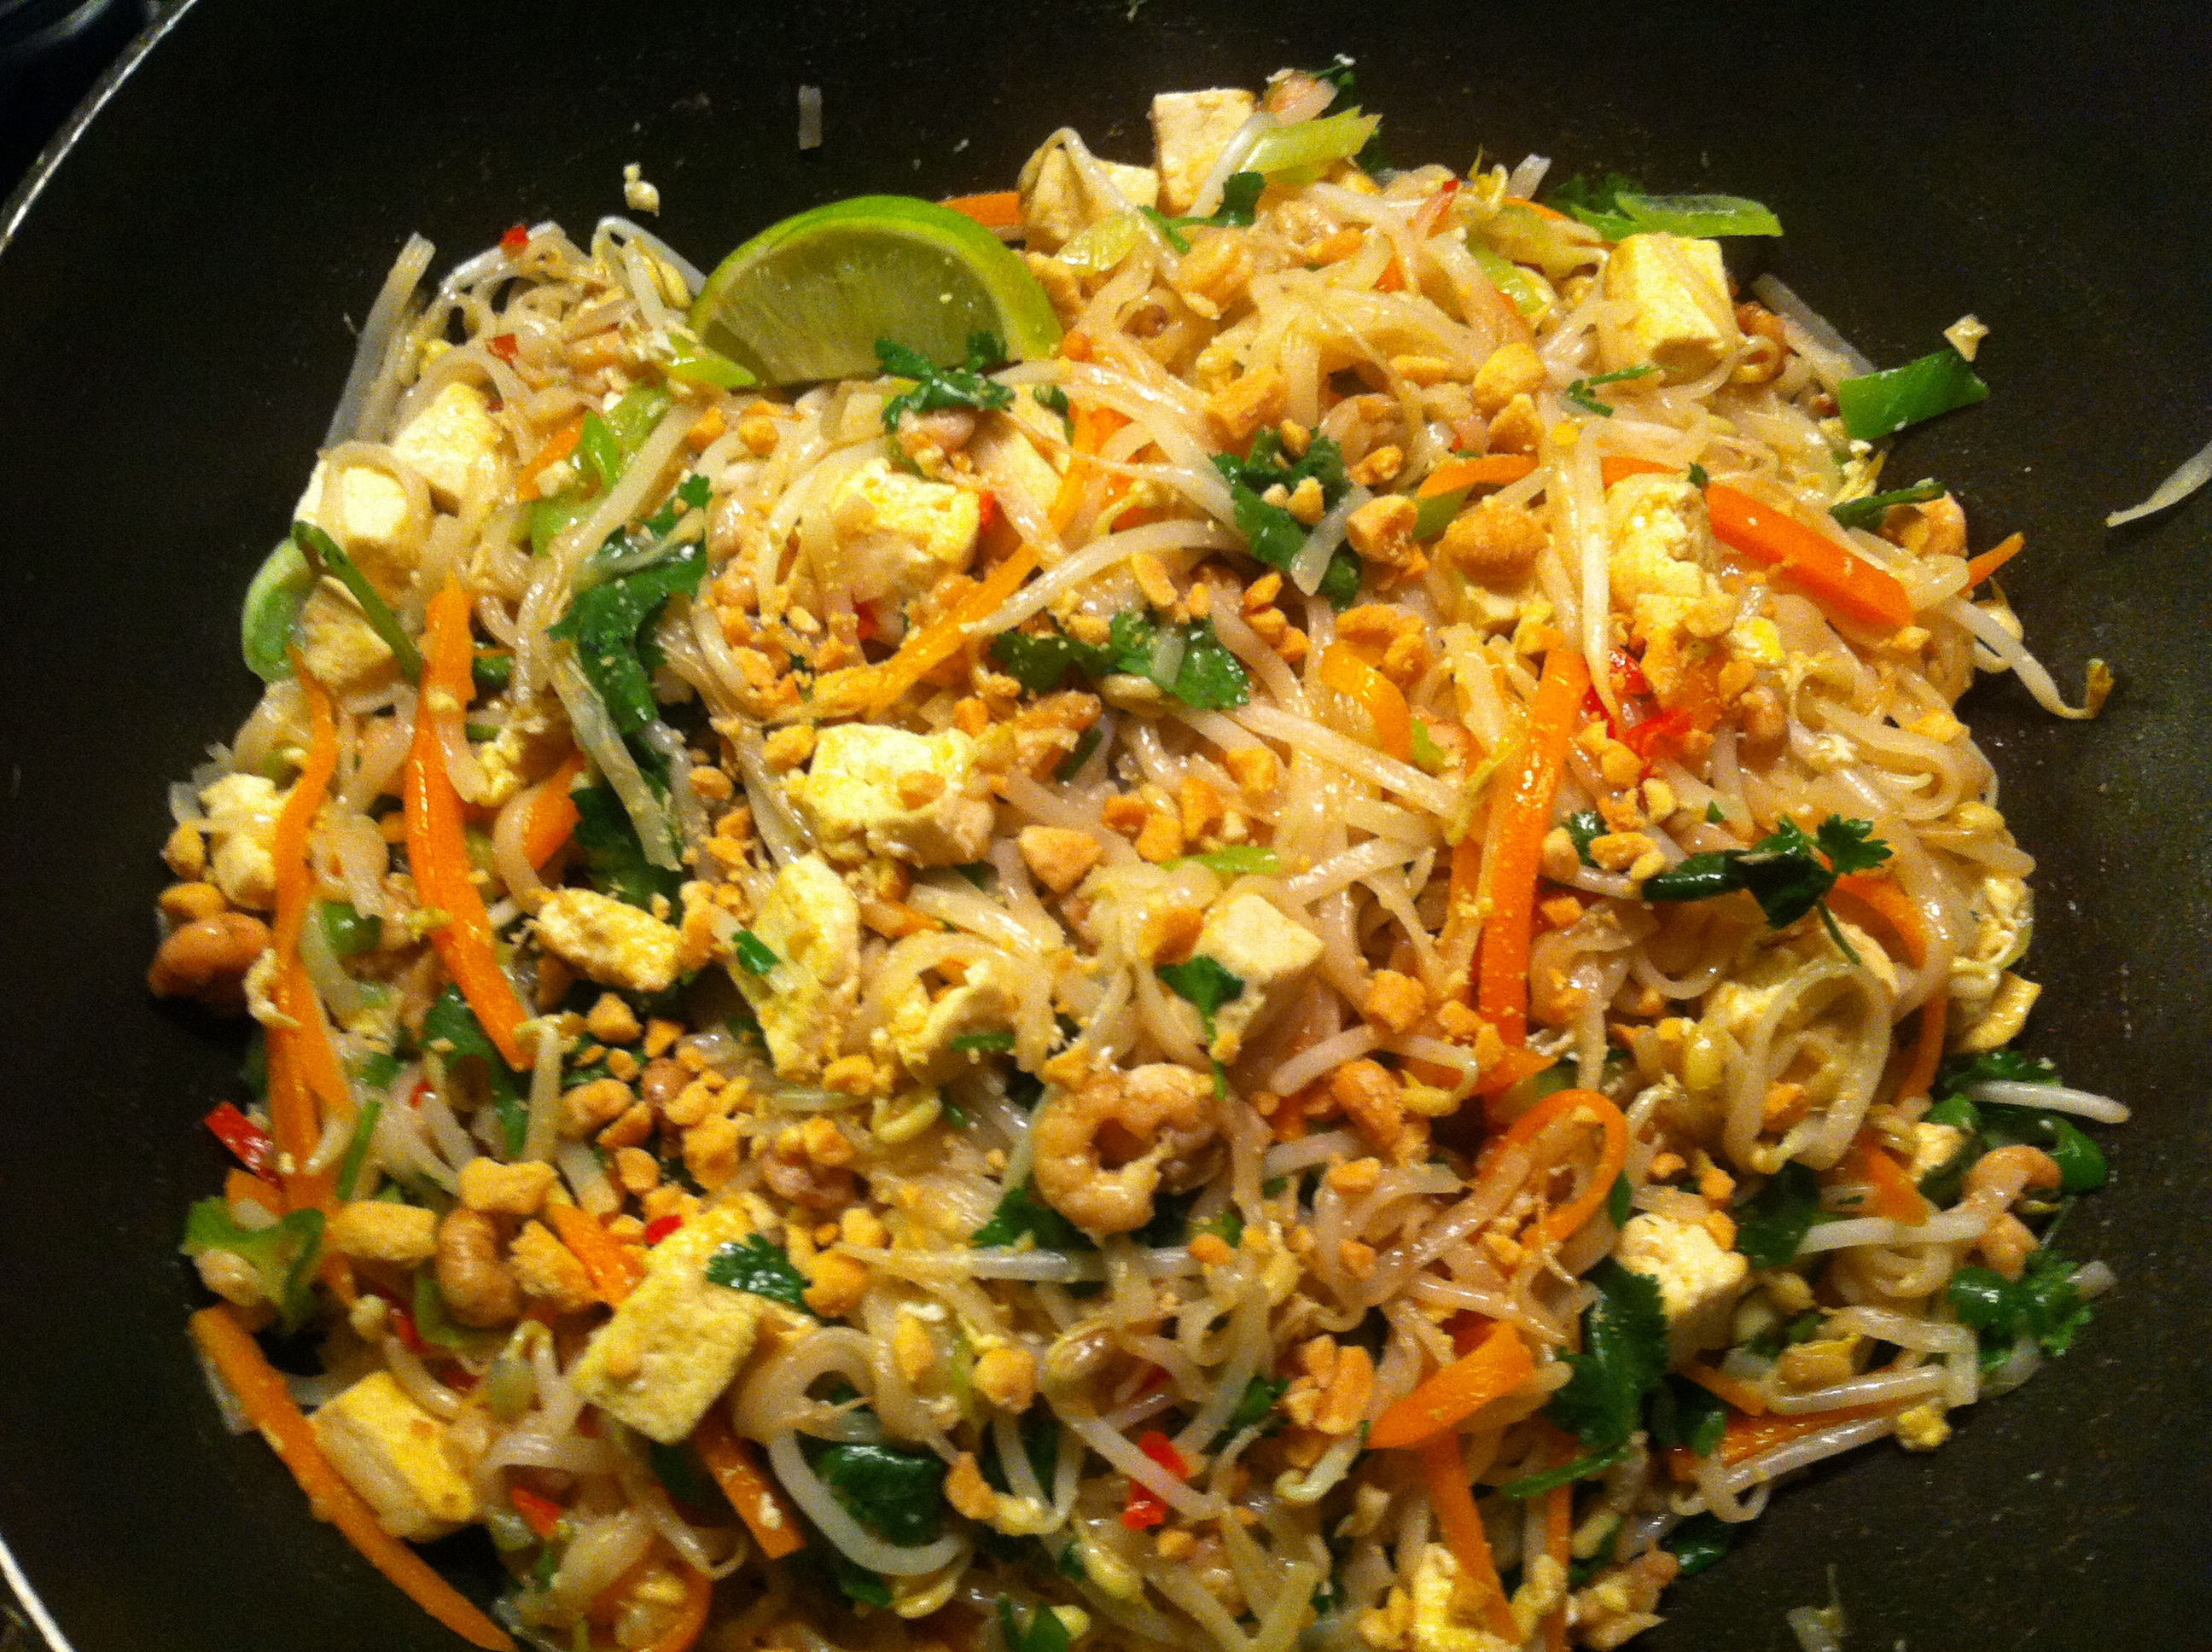 De lekkerste Thaise noedels, Pad Thai | STOER KOKEN